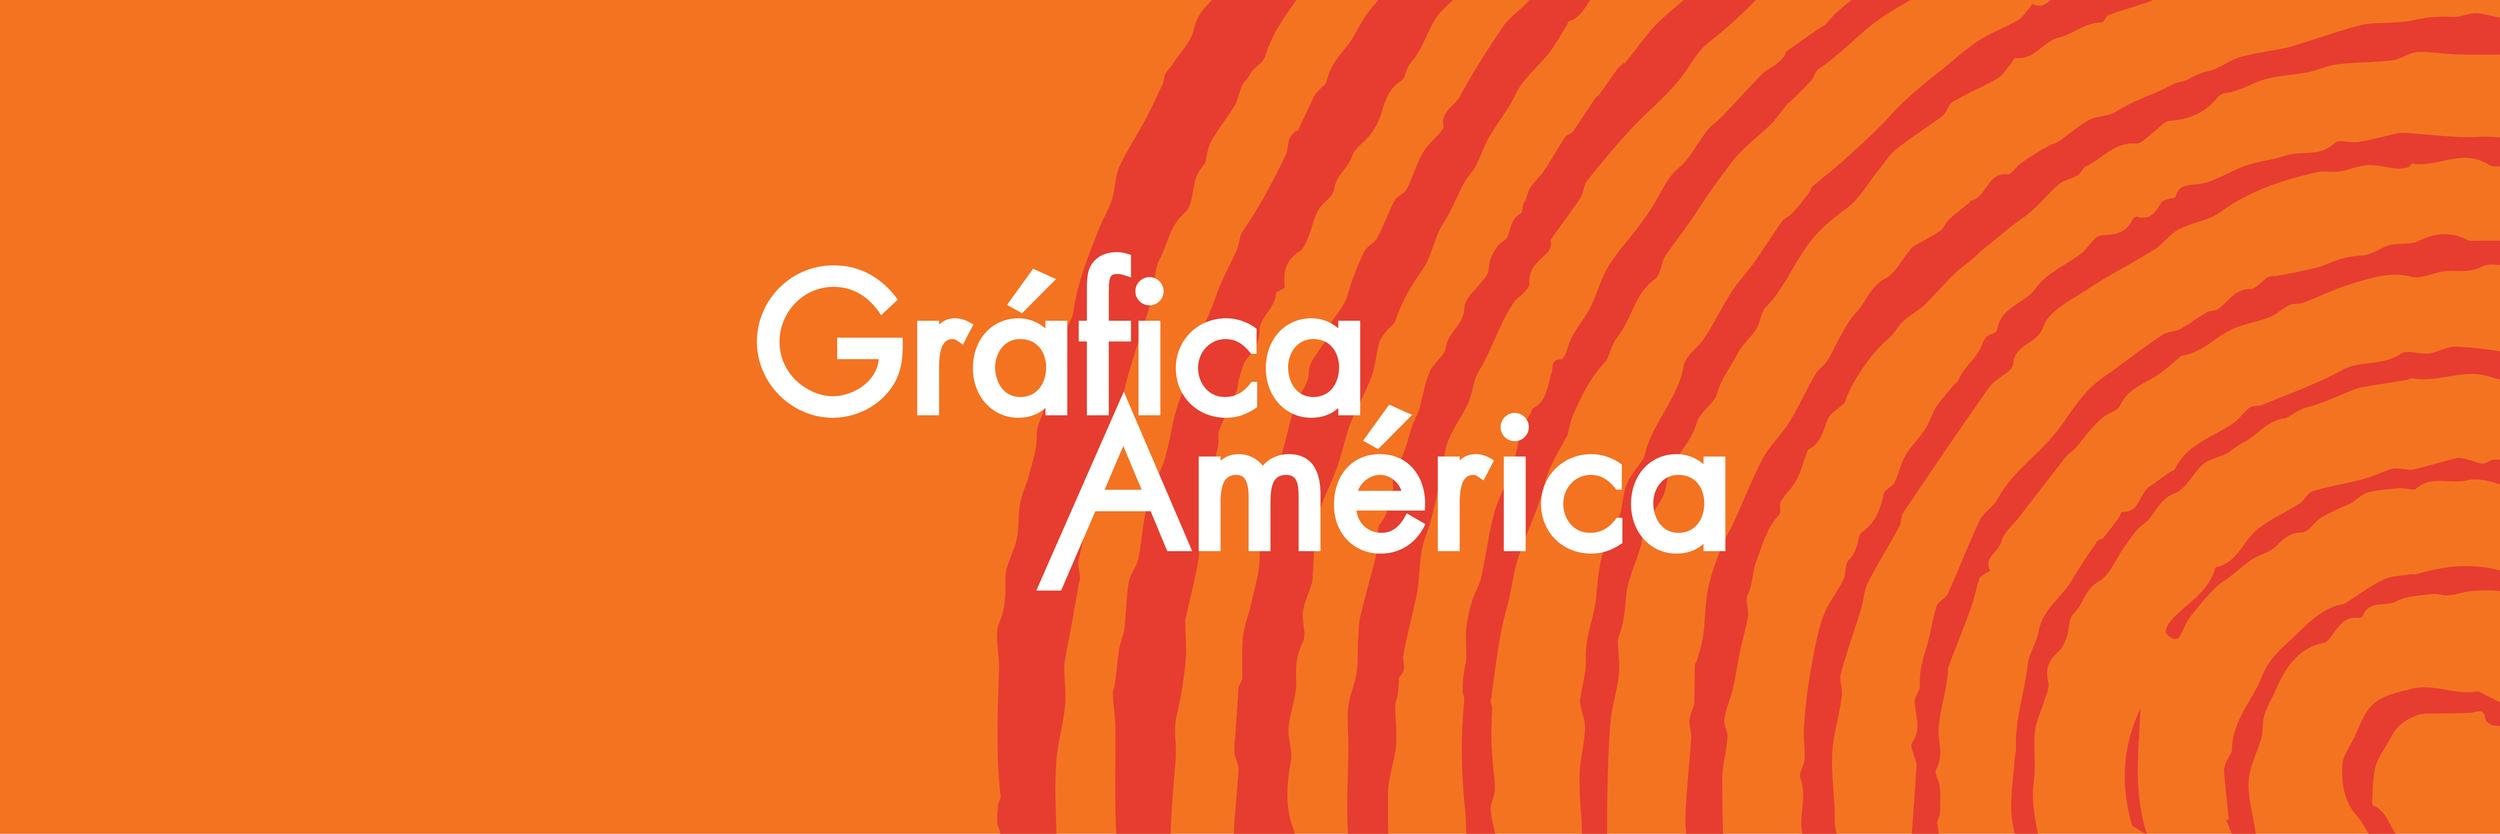 Grafica America Twitter Banner-01.png